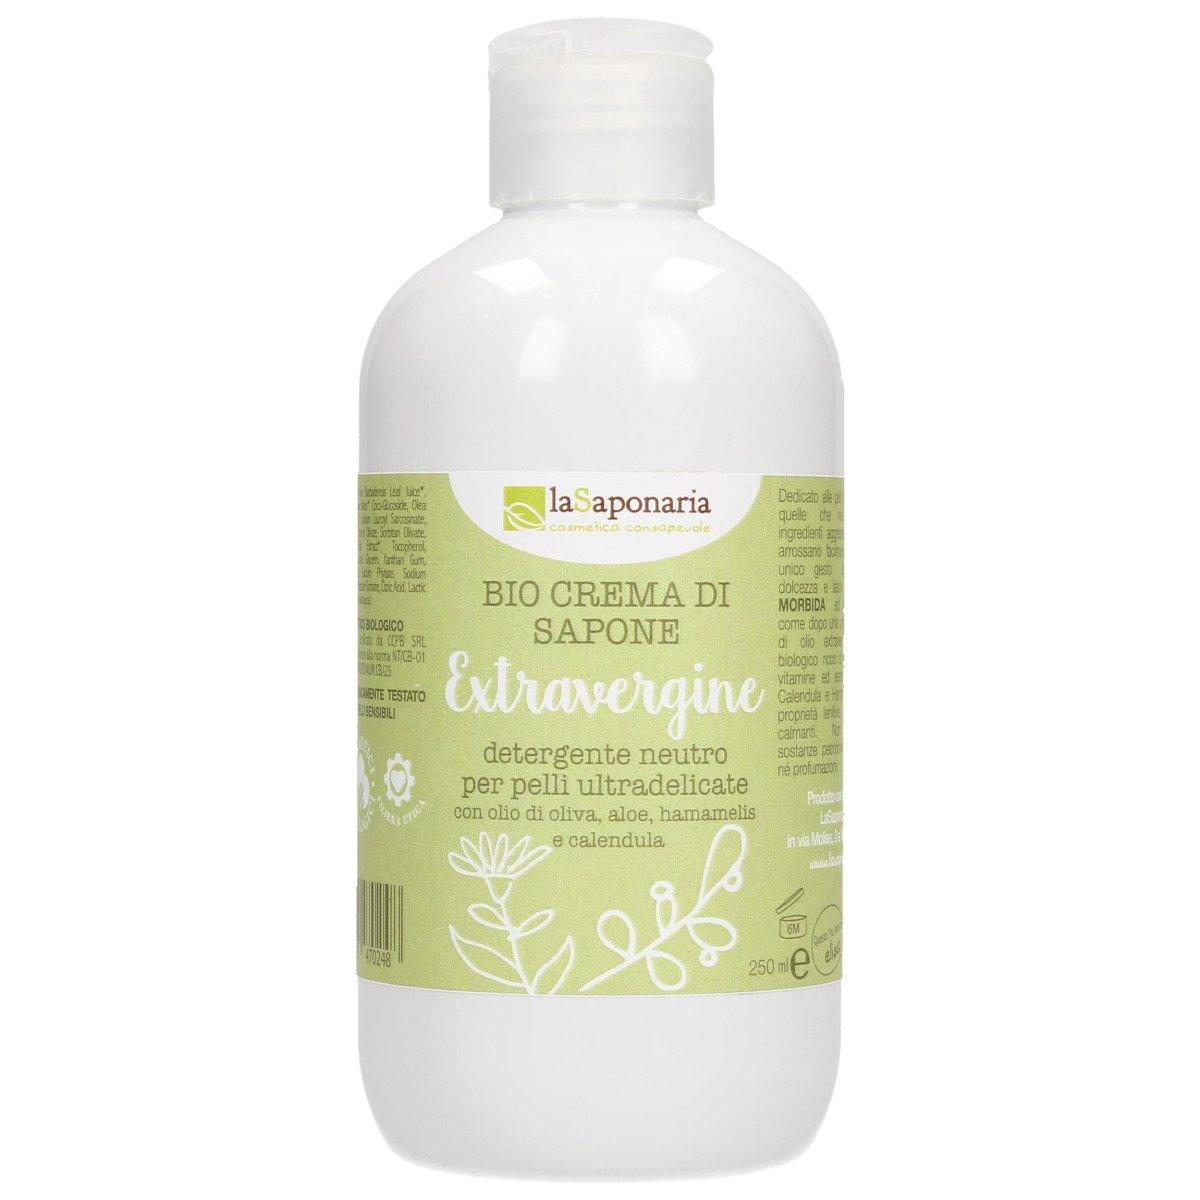 Crema di sapone extravergine - pelli ultadelicate